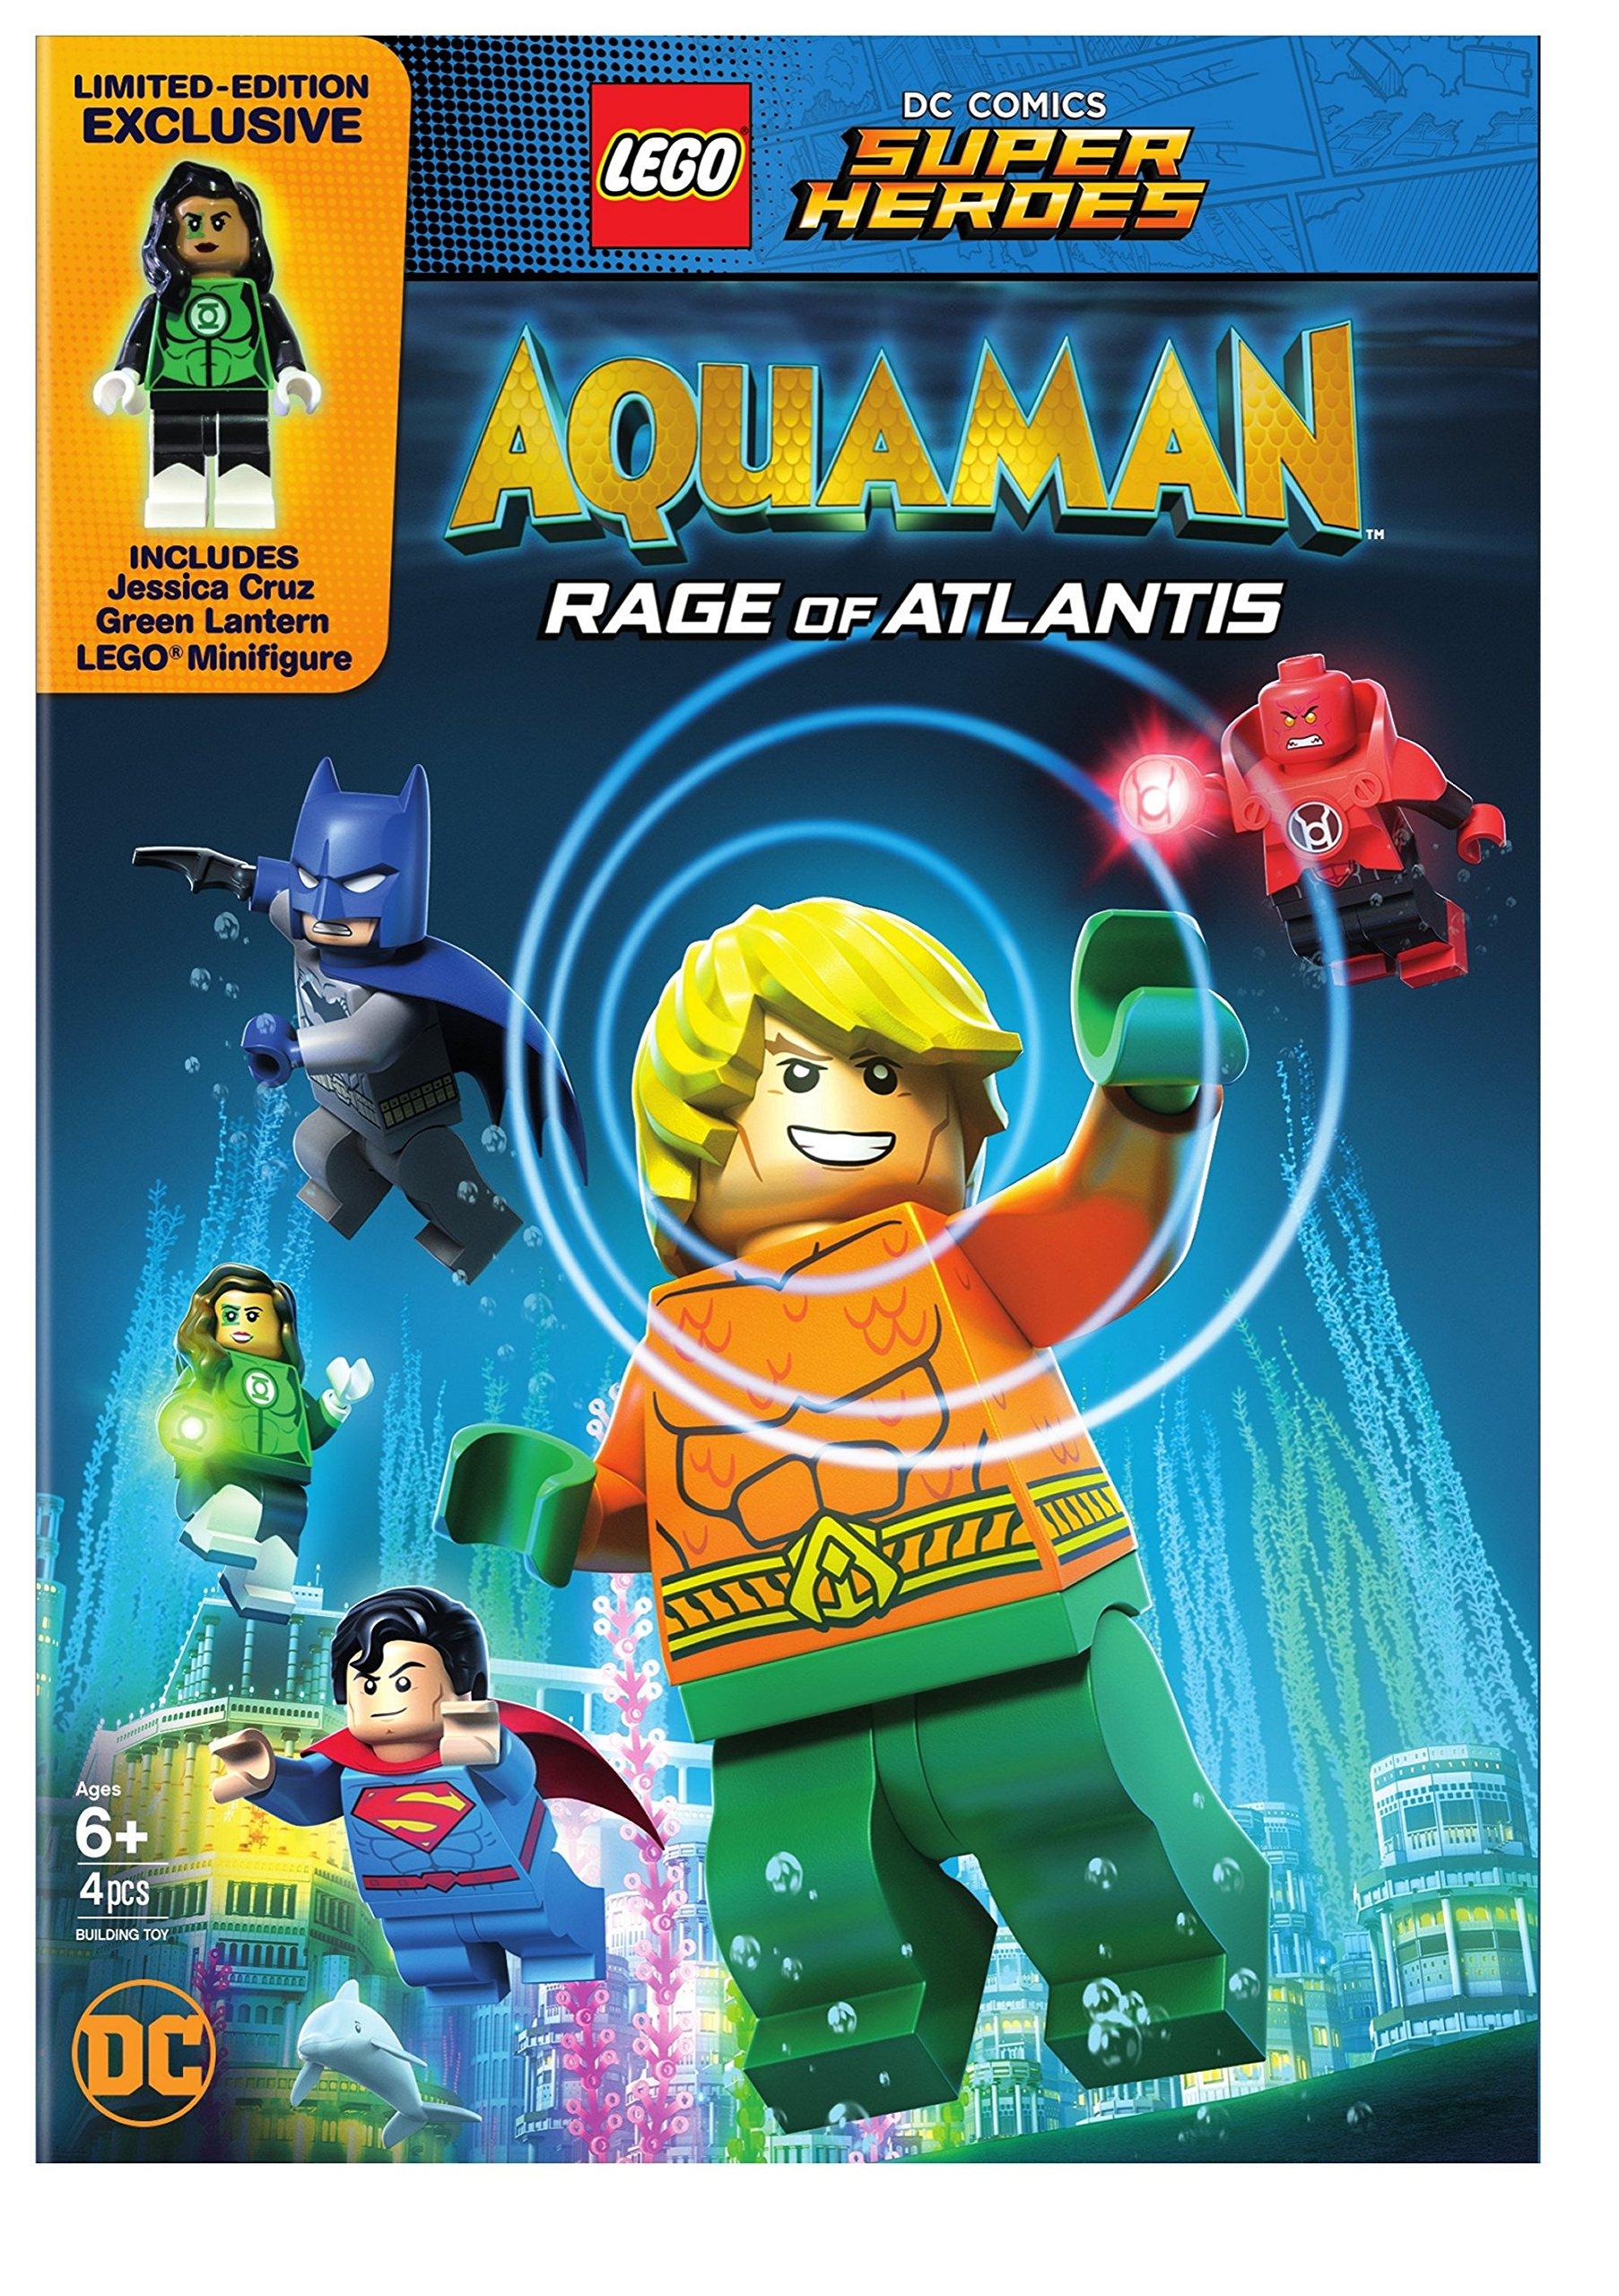 DVD : Lego Dc Super Heroes: Aquaman: Rage Of Atlantis (w/ Mini Figurine) (Figure, Dolby)